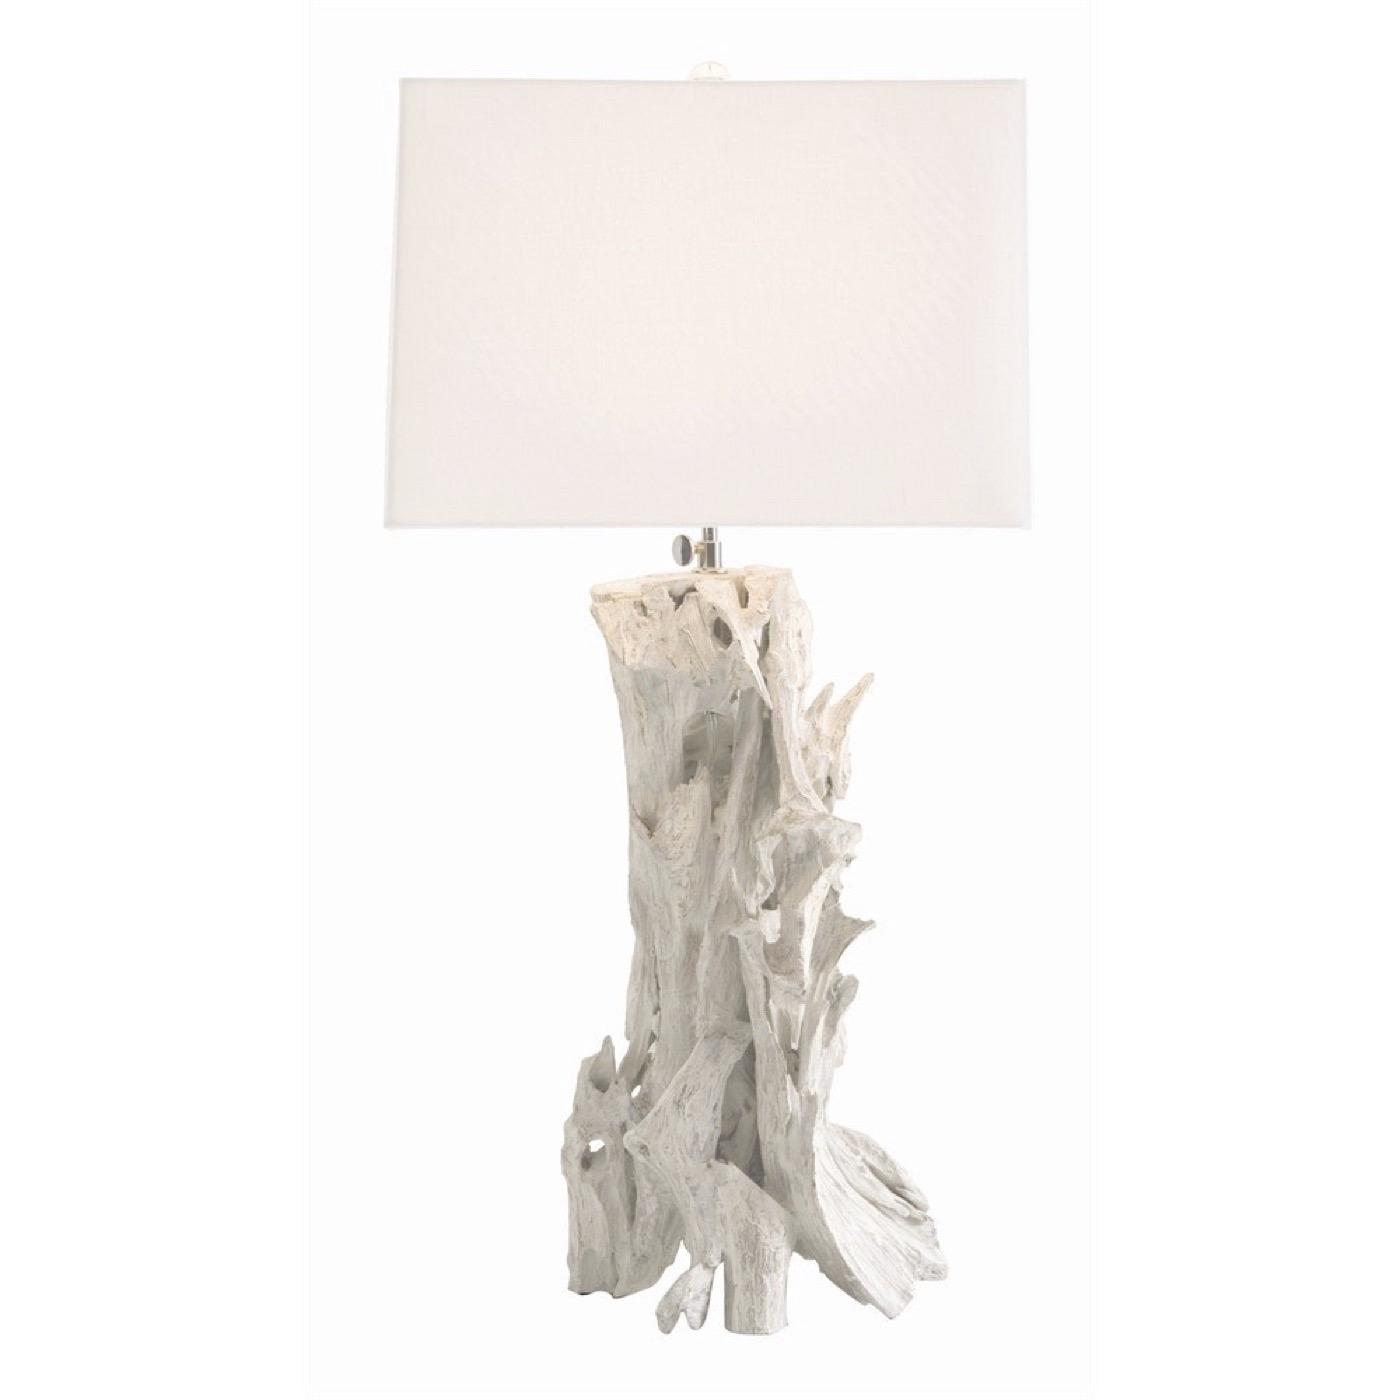 Falmouth Driftwood Lamp